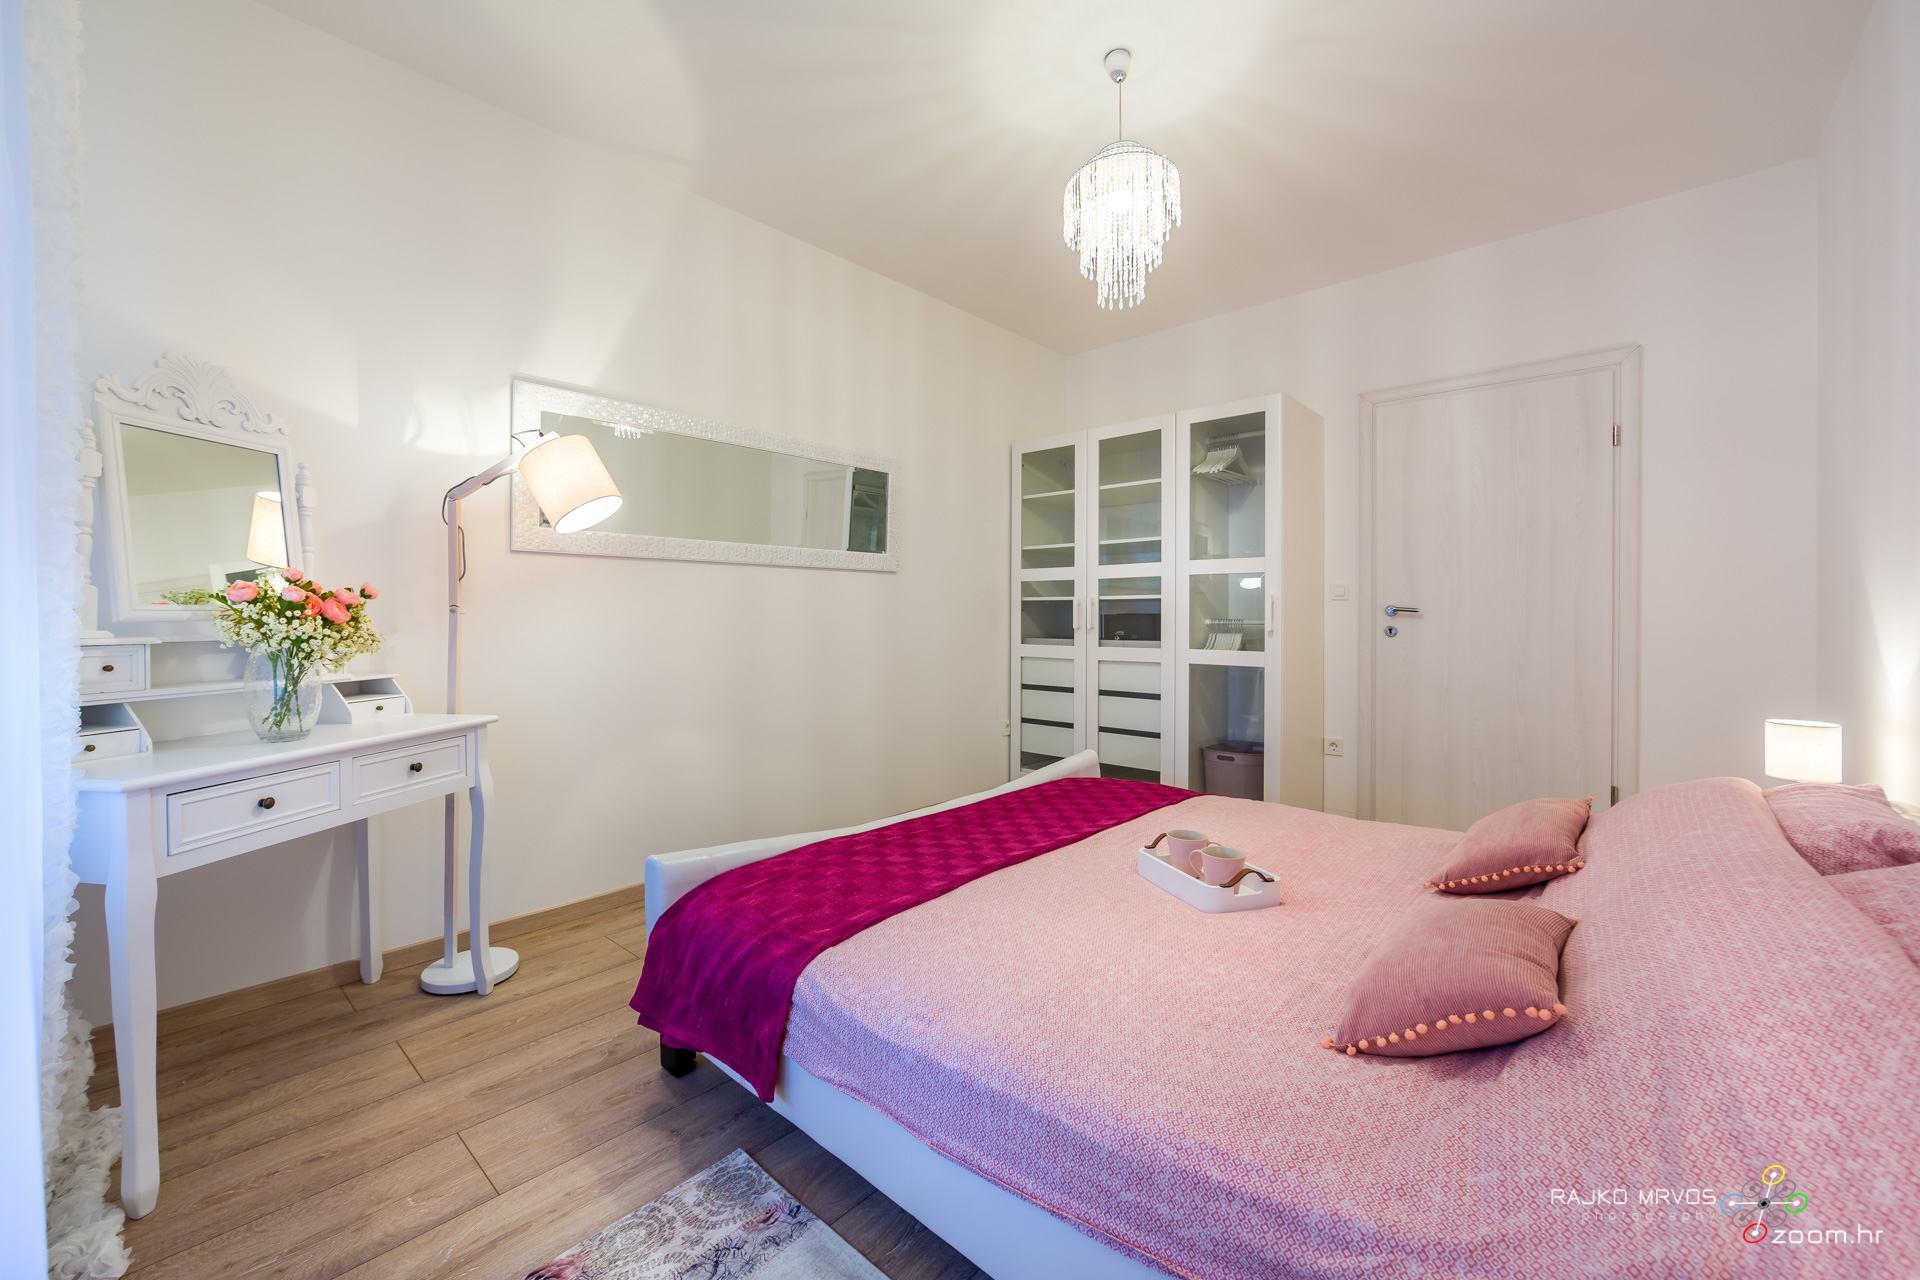 fotografiranje-interijera-fotograf-apartmana-vila-kuca-hotela-apartman-Gabby-Rijeka-7